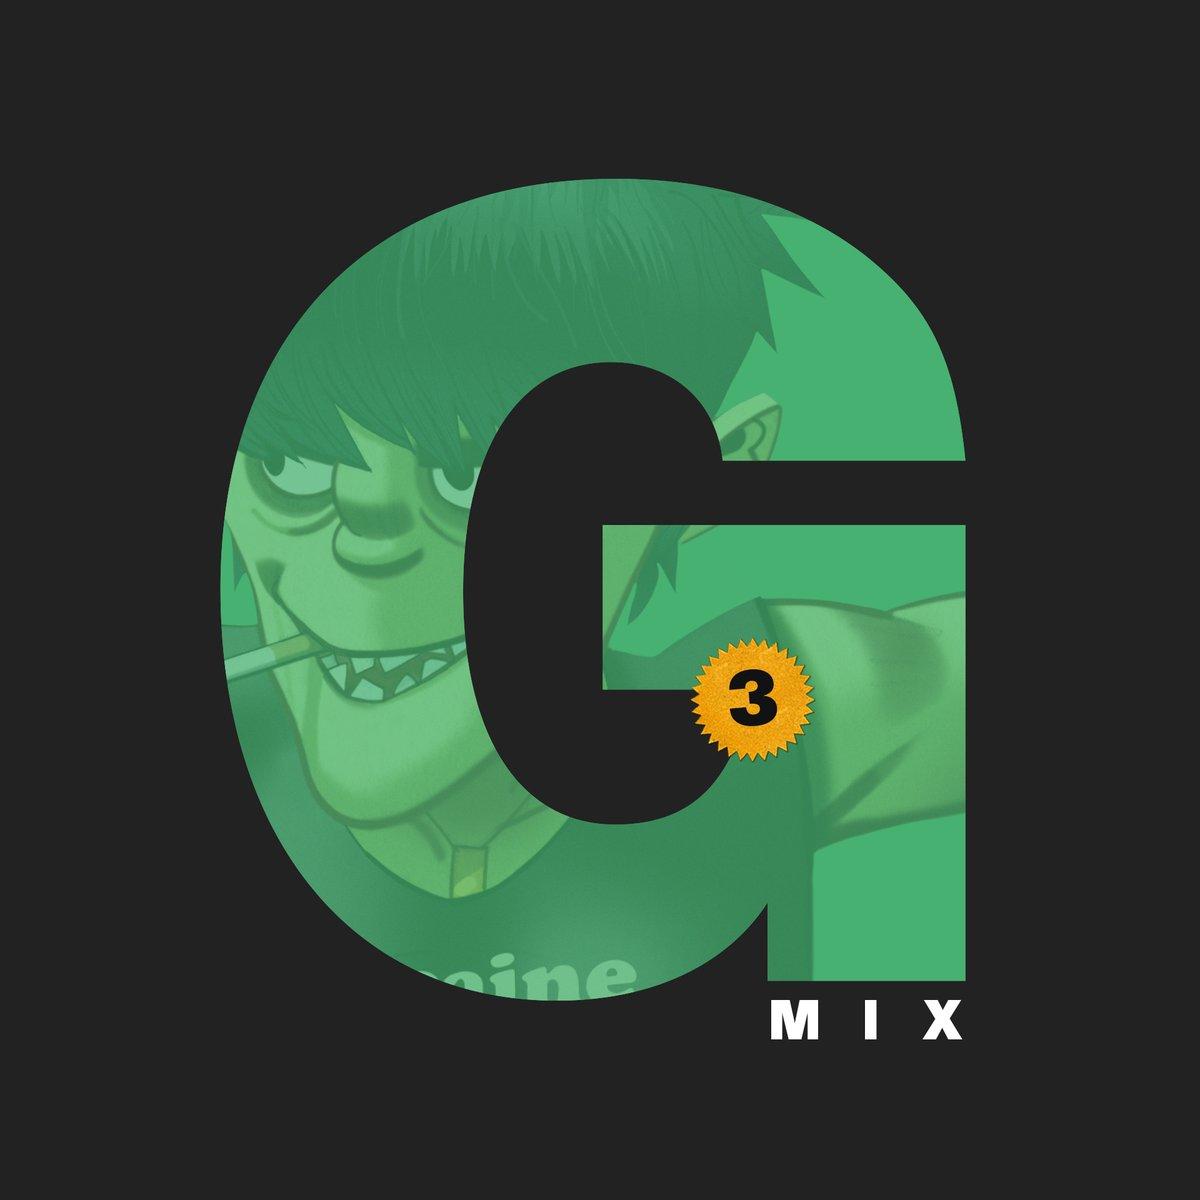 G-Mix: Murdoc 3